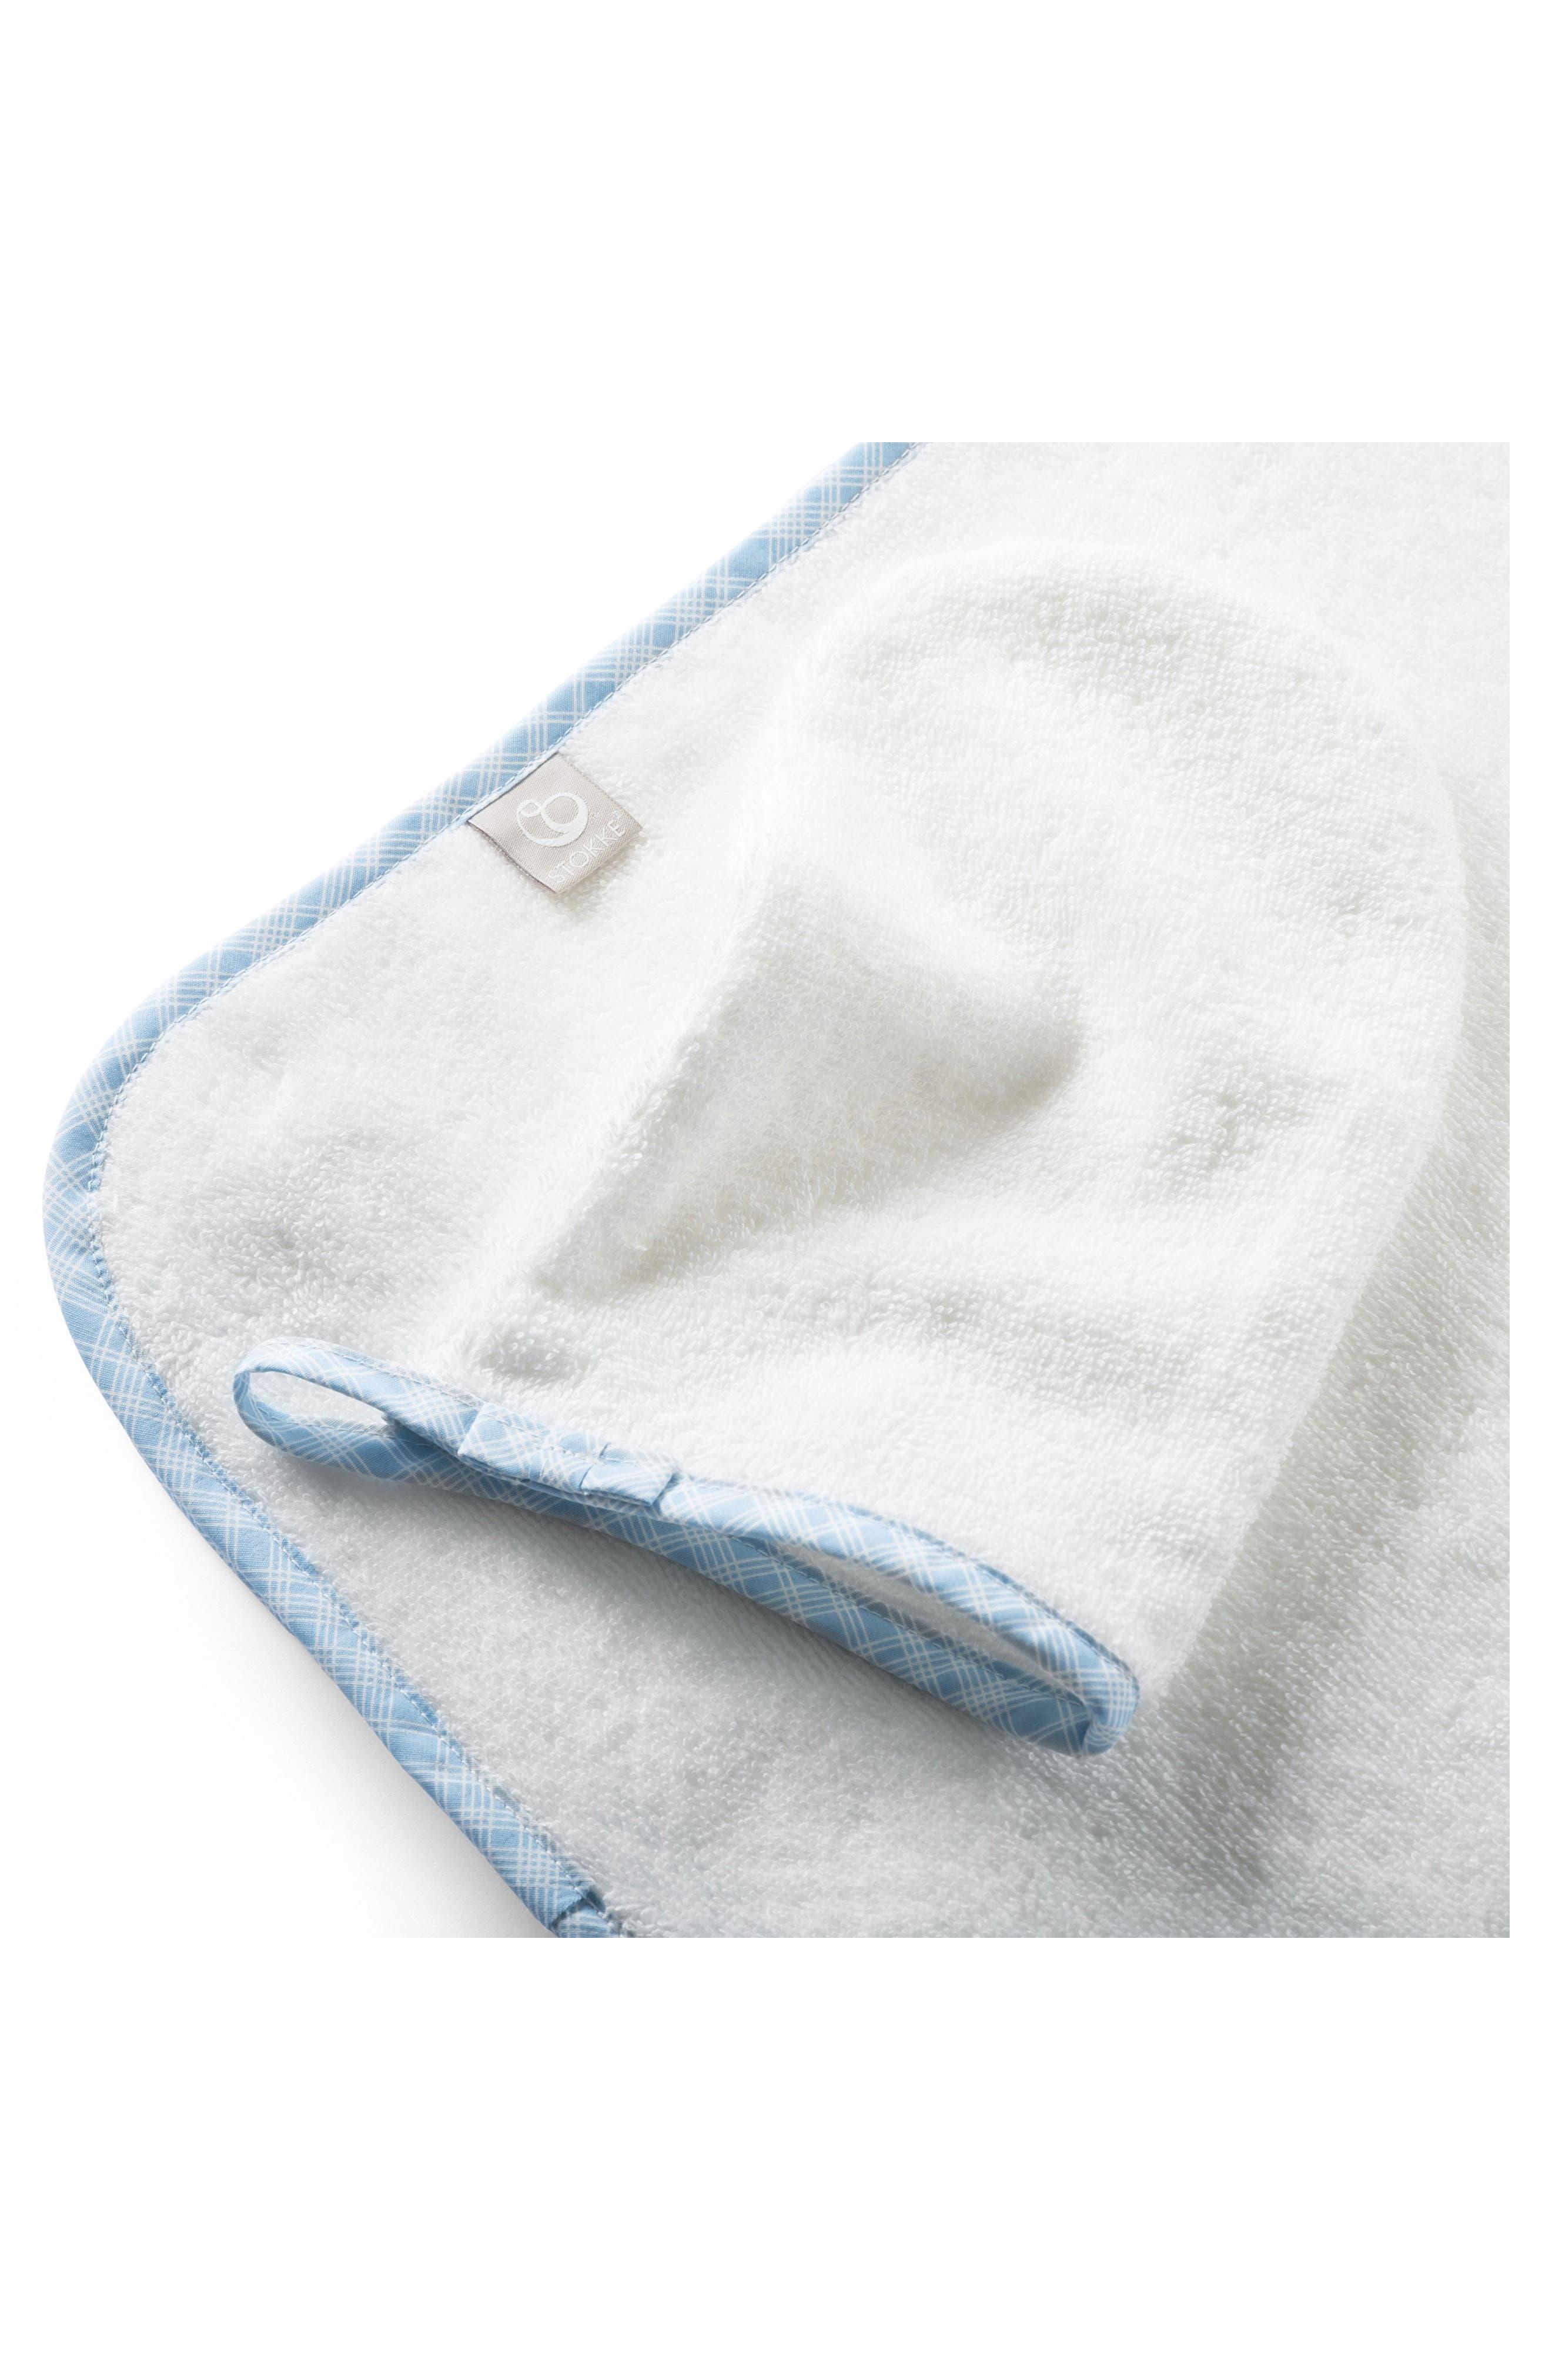 Hooded Towel & Bath Mitt Set,                             Alternate thumbnail 3, color,